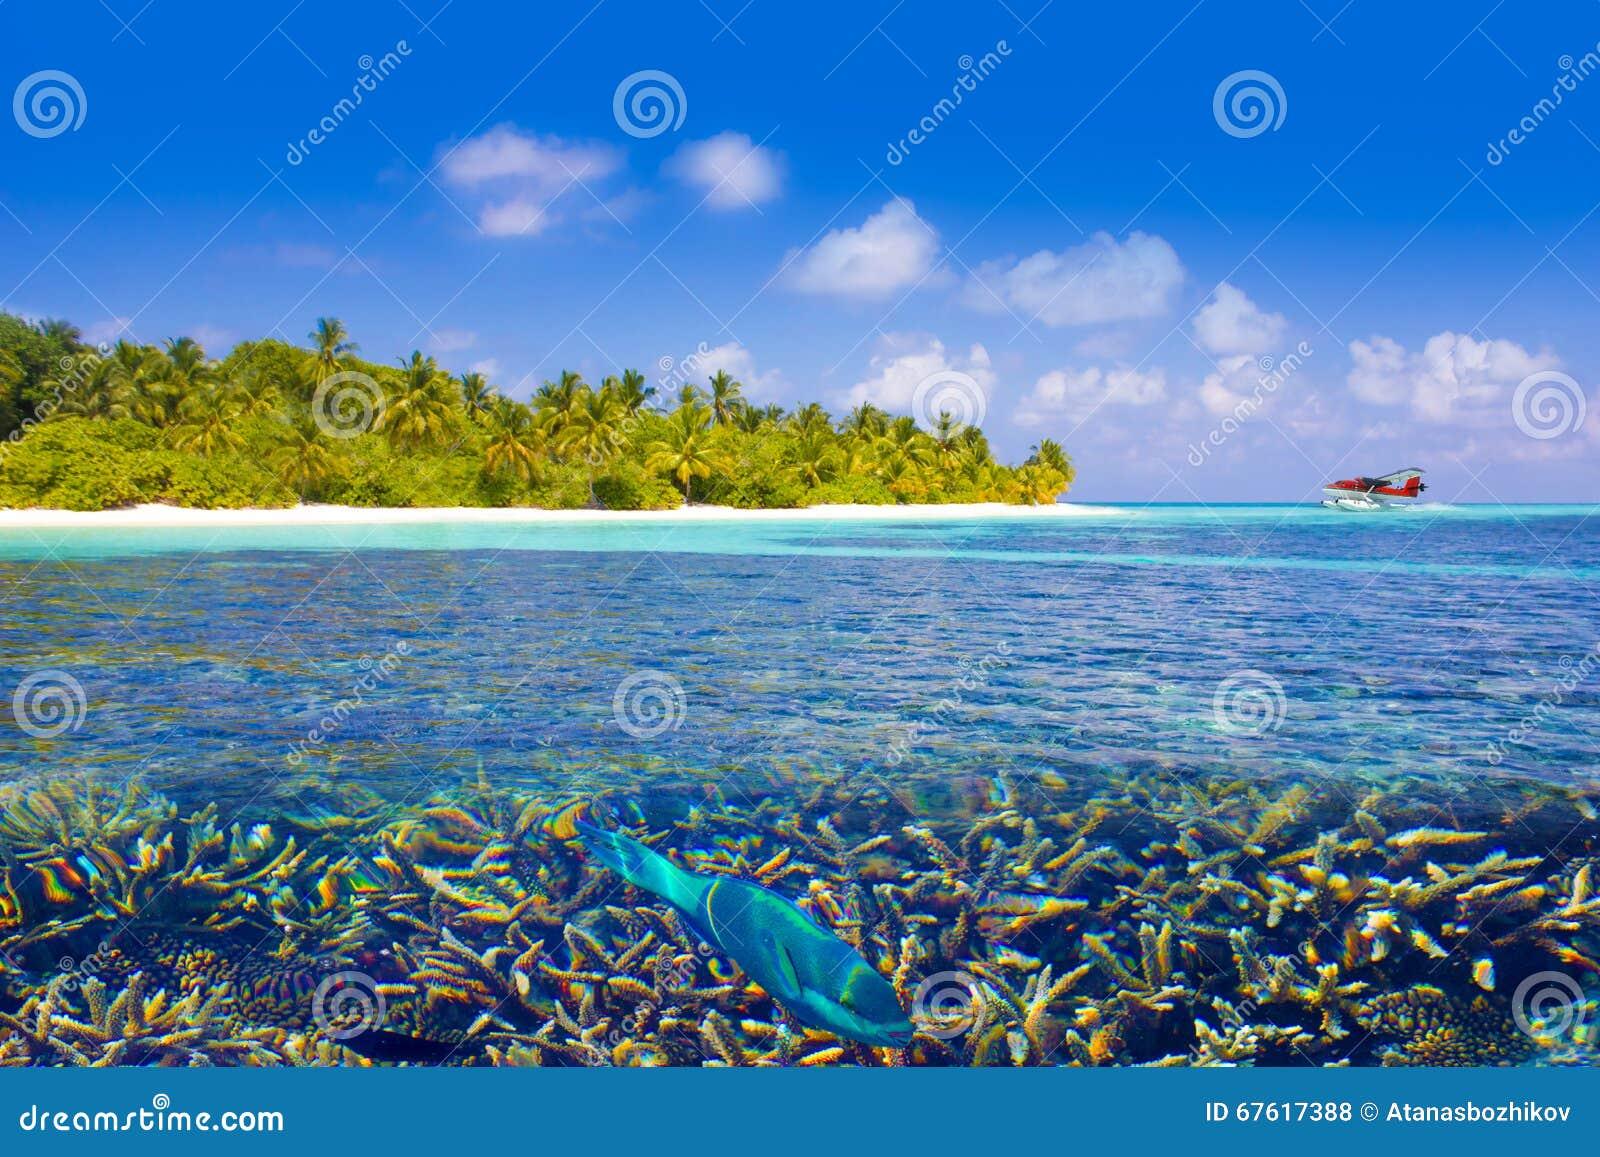 Wasserflugzeuglandung in den Malediven, Eden auf Erde